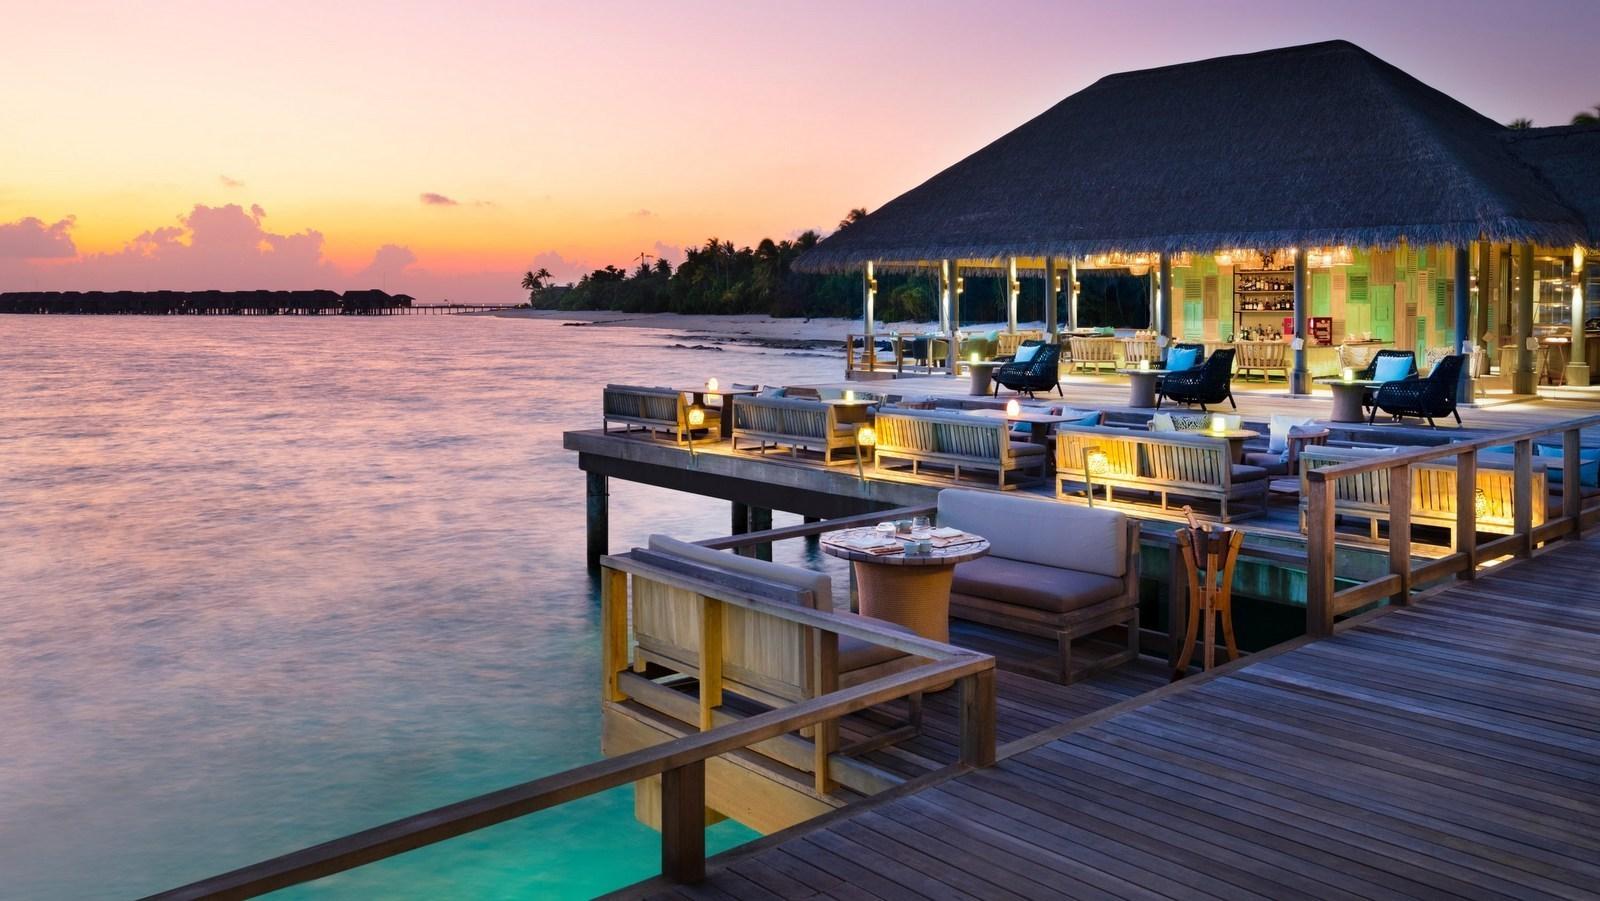 Мальдивы, отель Vakkaru Maldives, бар Lagoon